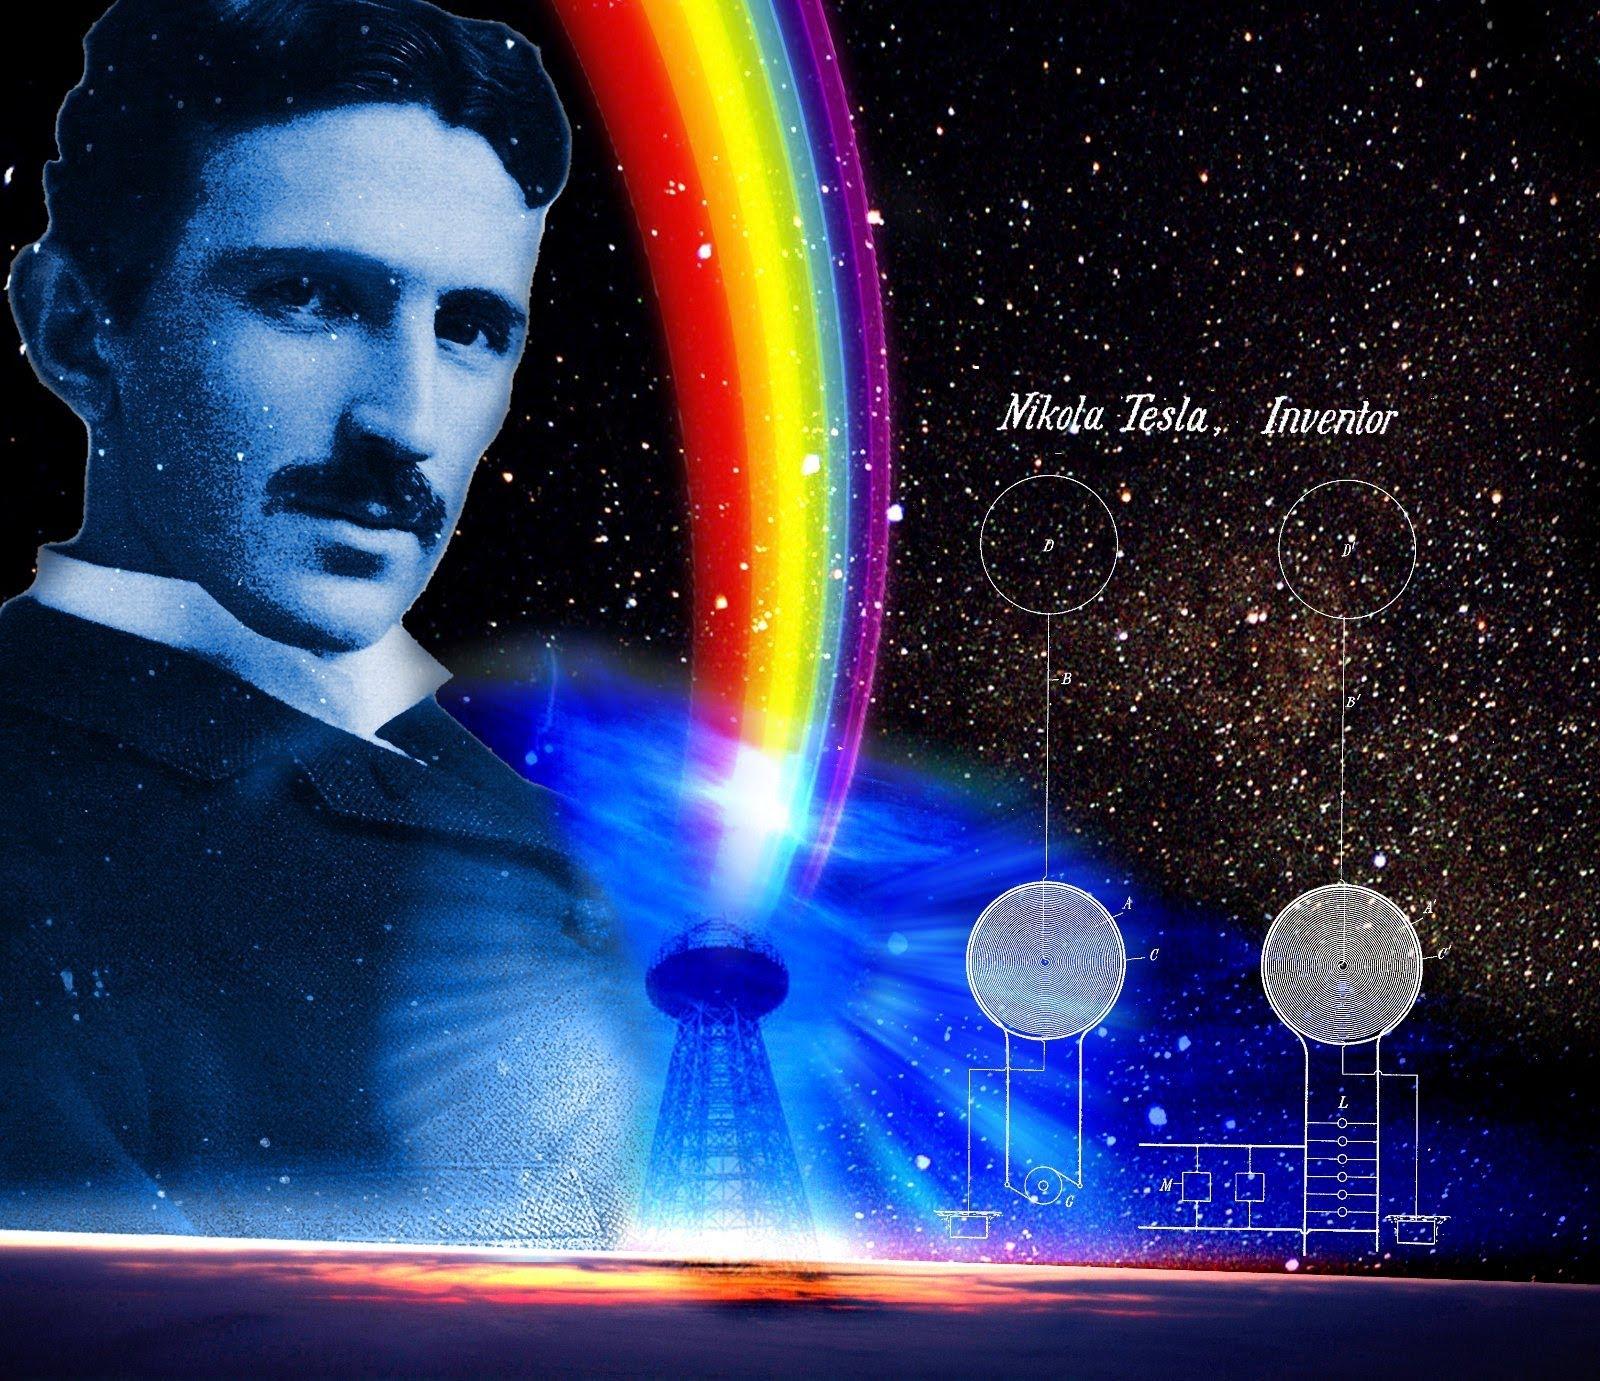 Nikola Tesla Wallpapers High Quality Download Free